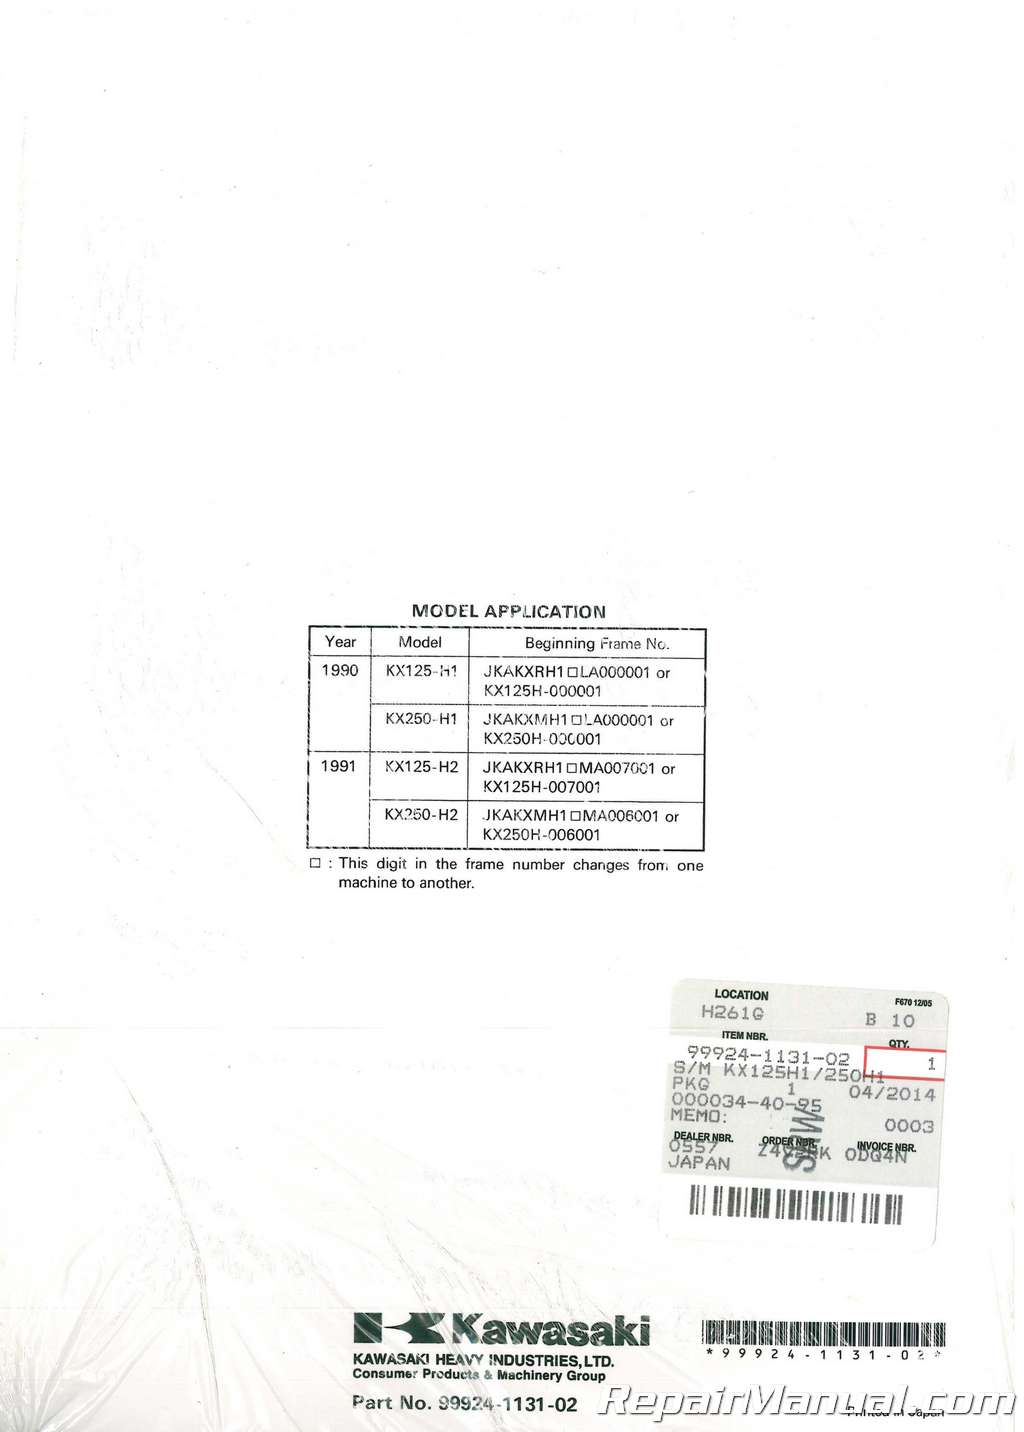 1990 1991 kawasaki kx125h1 kx250h1 service manual 99924 1131 02 ebay. Black Bedroom Furniture Sets. Home Design Ideas